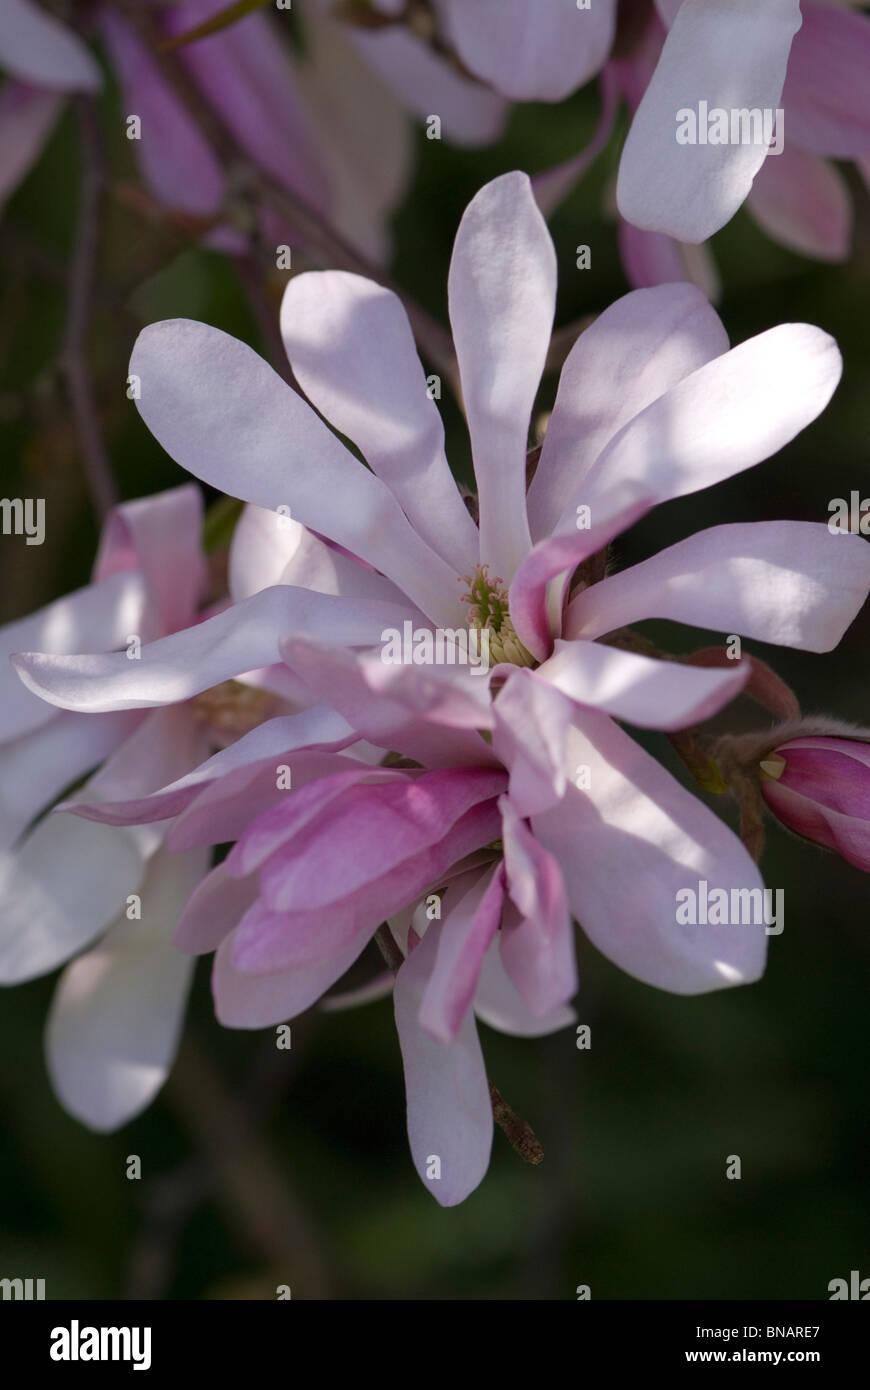 Magnolia Leonard Messel Stock Photo